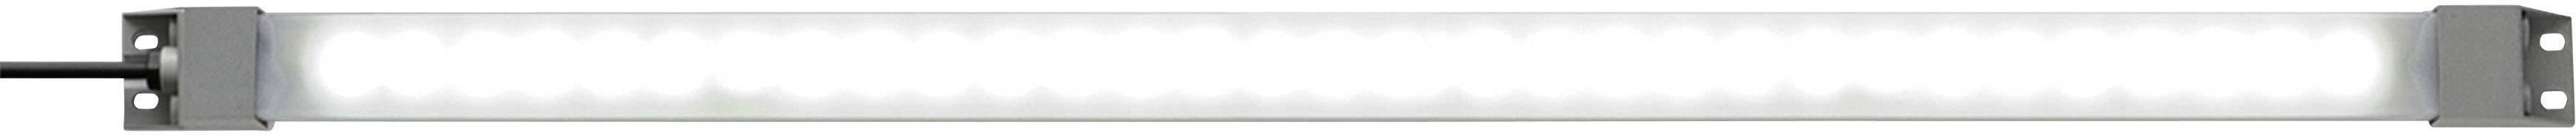 Idec LF1B-ND4P-2THWW2-3M, biela, 600 lm, 8.7 W, 24 V/DC